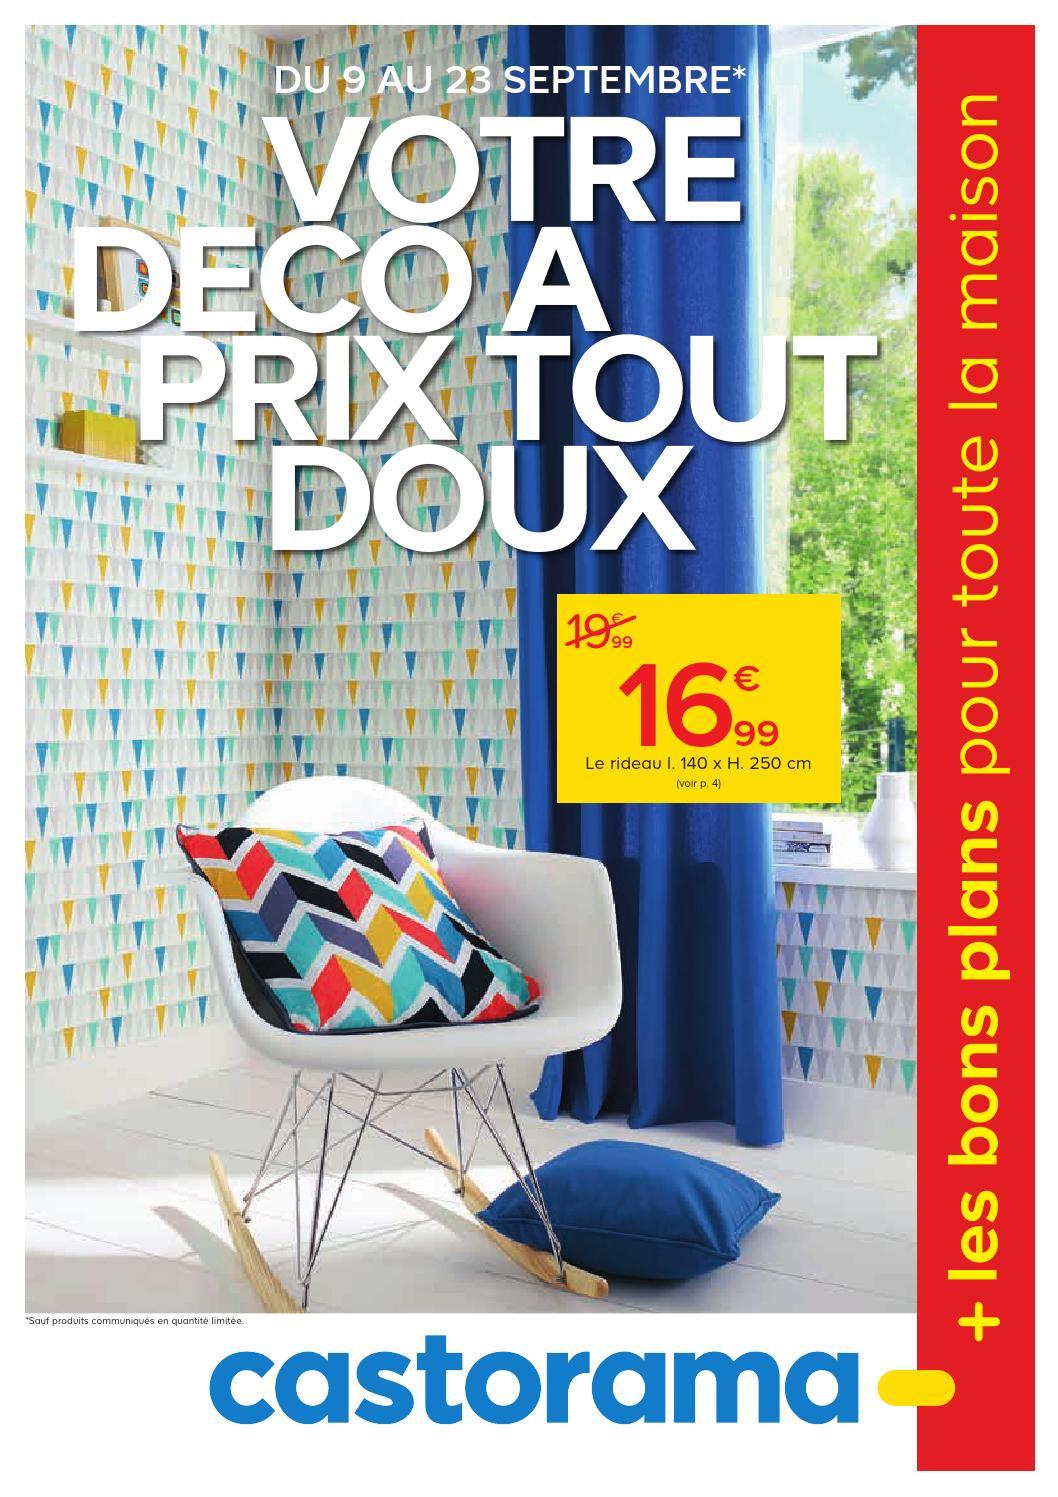 castorama catalogue 9 23septembre2015 by issuu. Black Bedroom Furniture Sets. Home Design Ideas